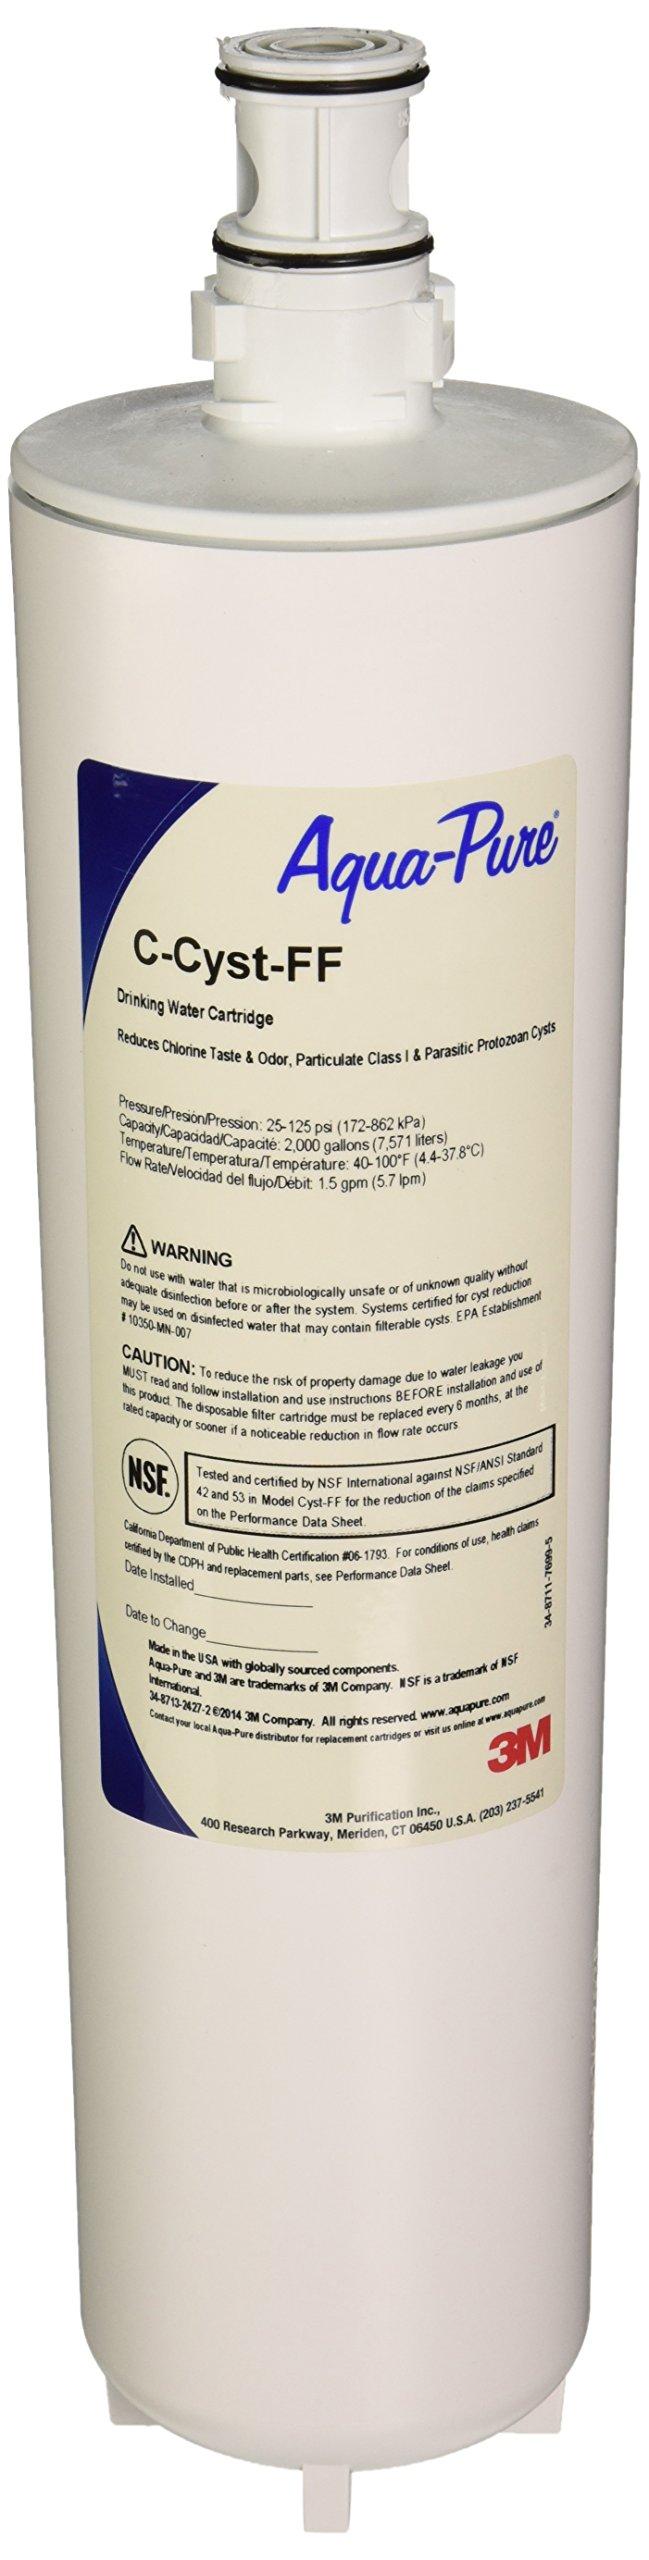 Aqua Pure C-CYST-FF Undersink Filter Replacement Cartridge